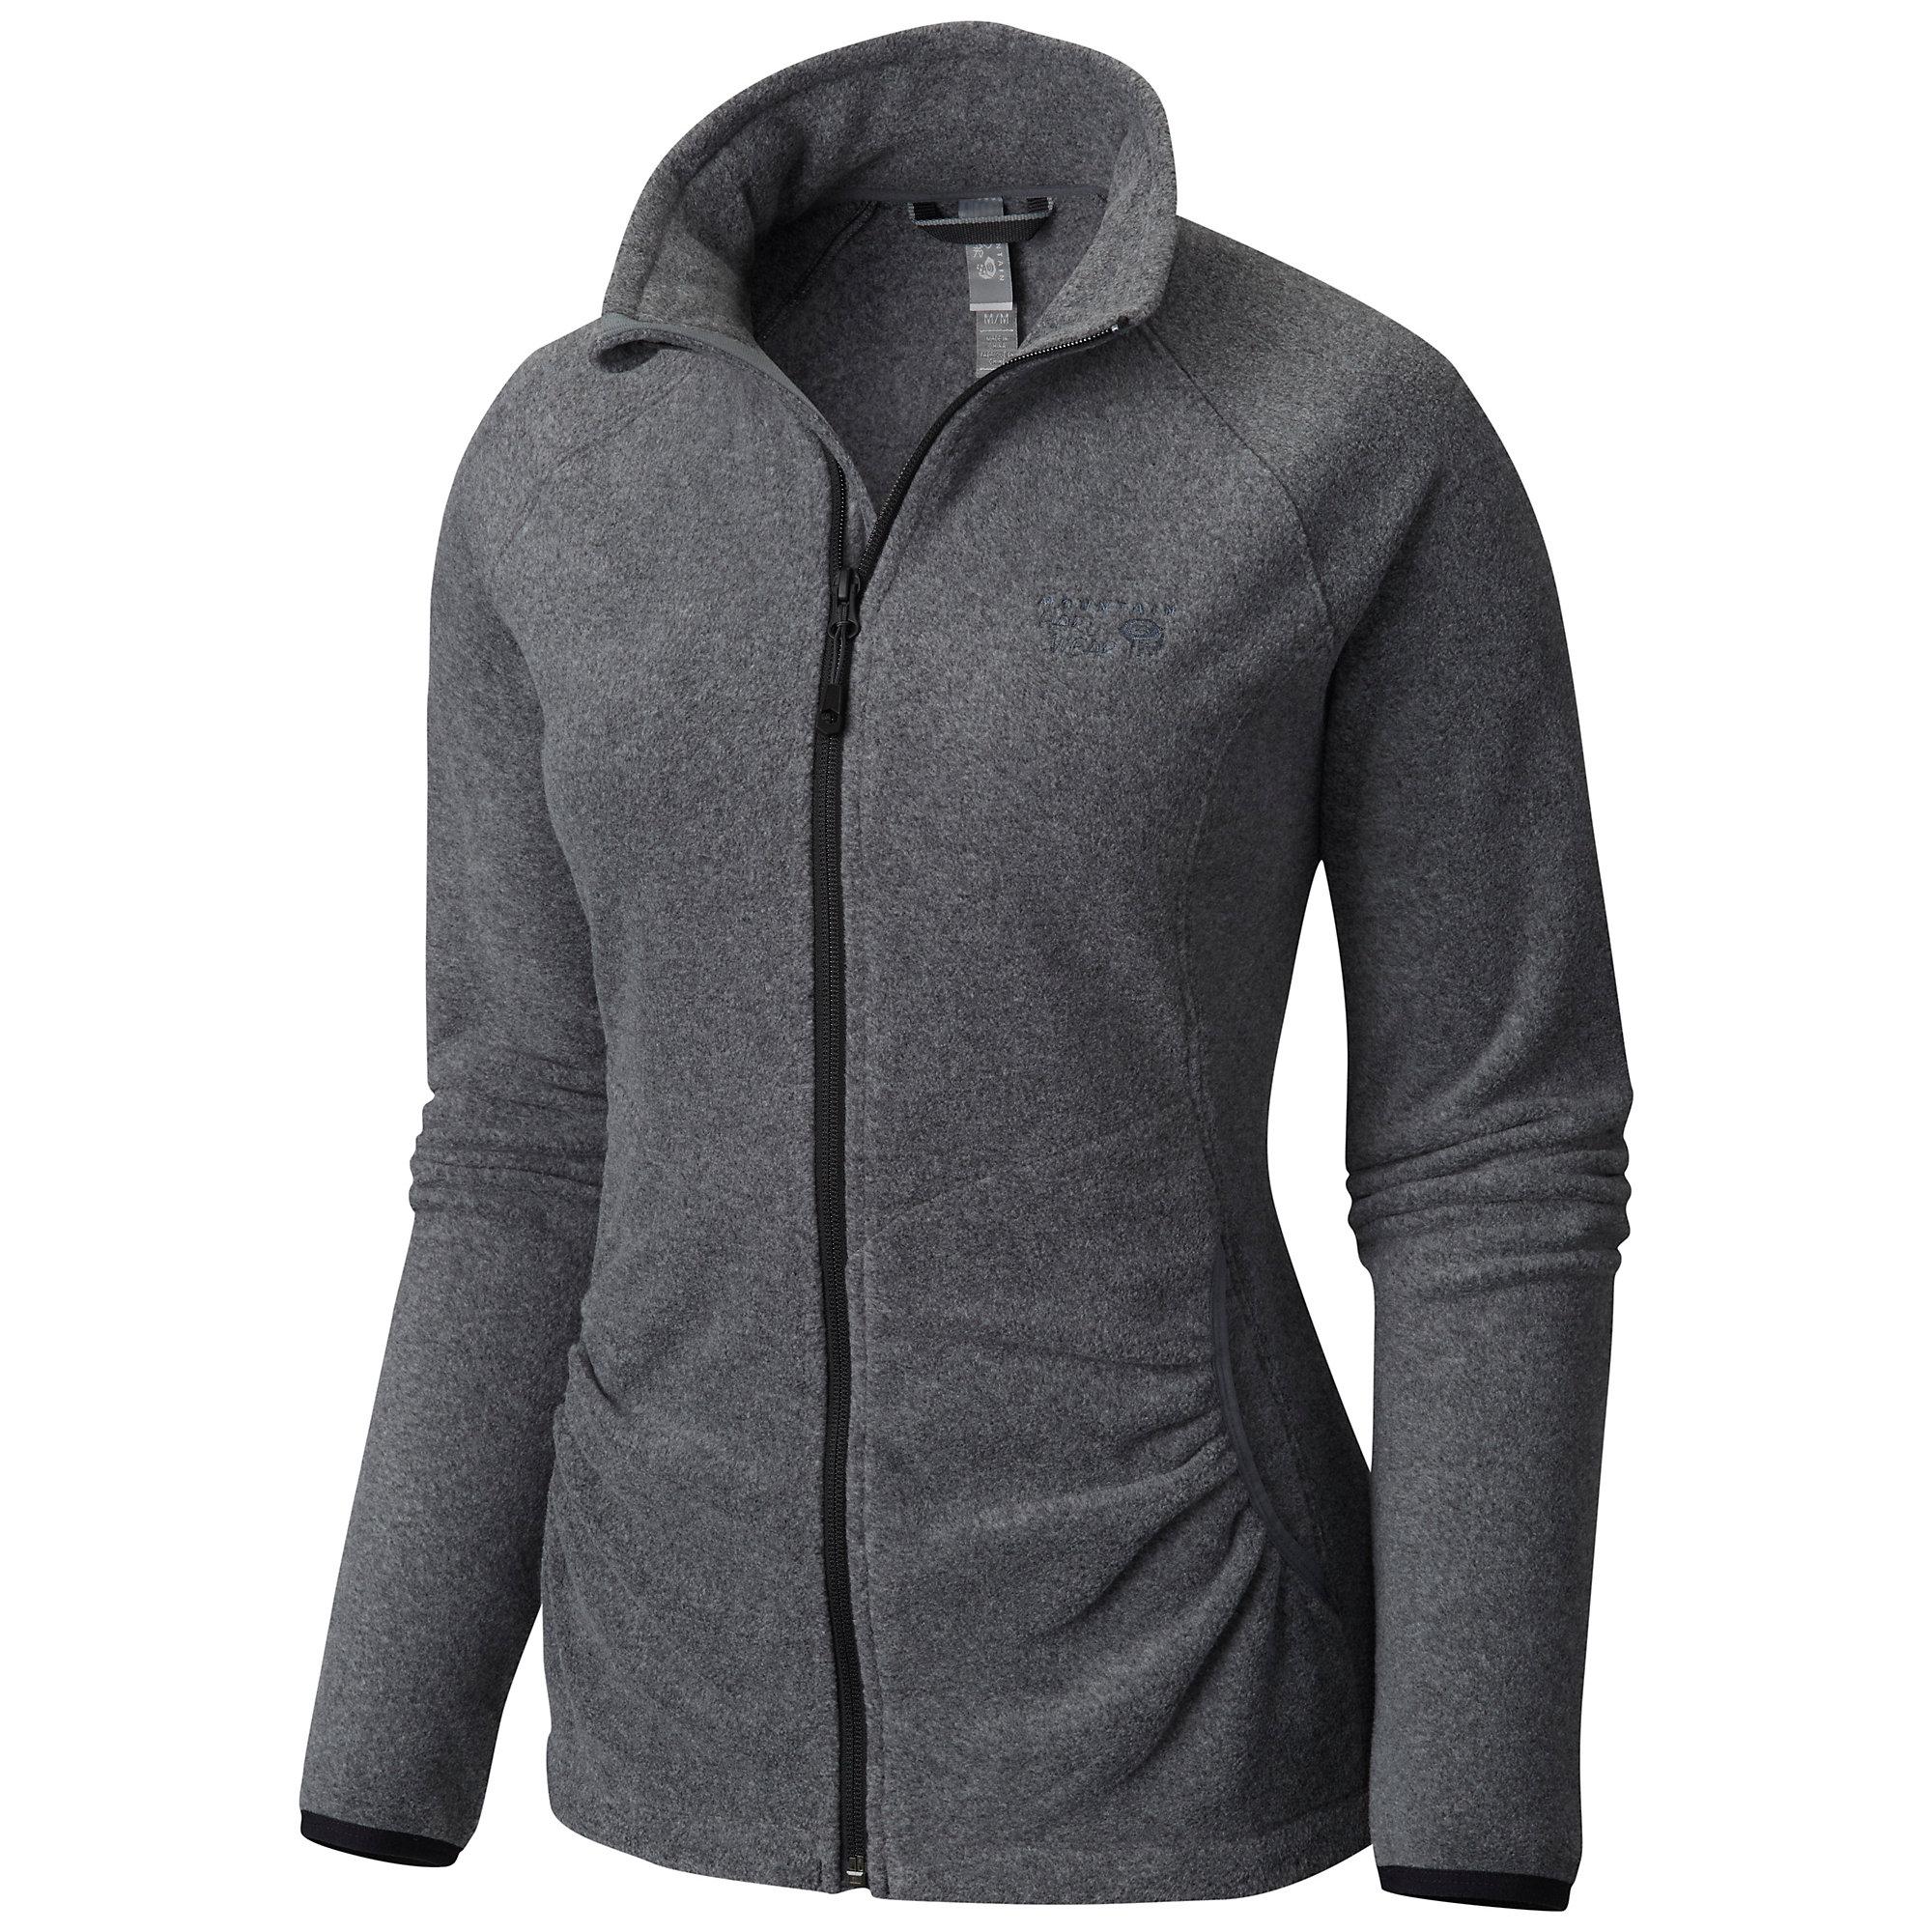 Mountain Hardwear Escalon Jacket